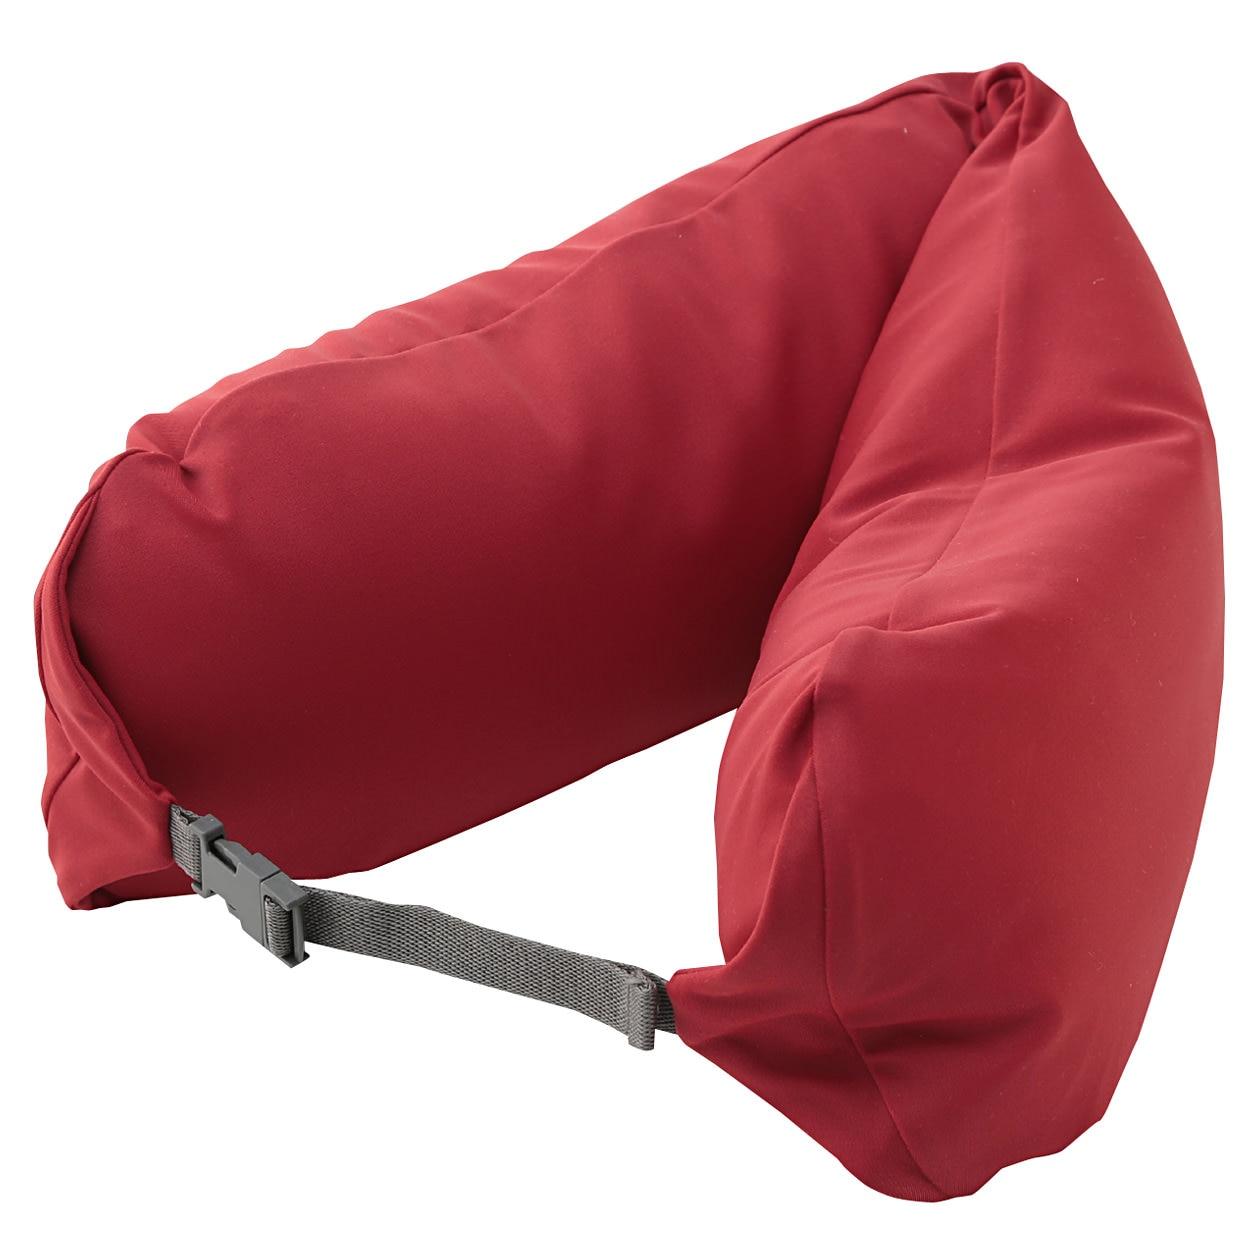 neck cushion red 16 5x67cm muji